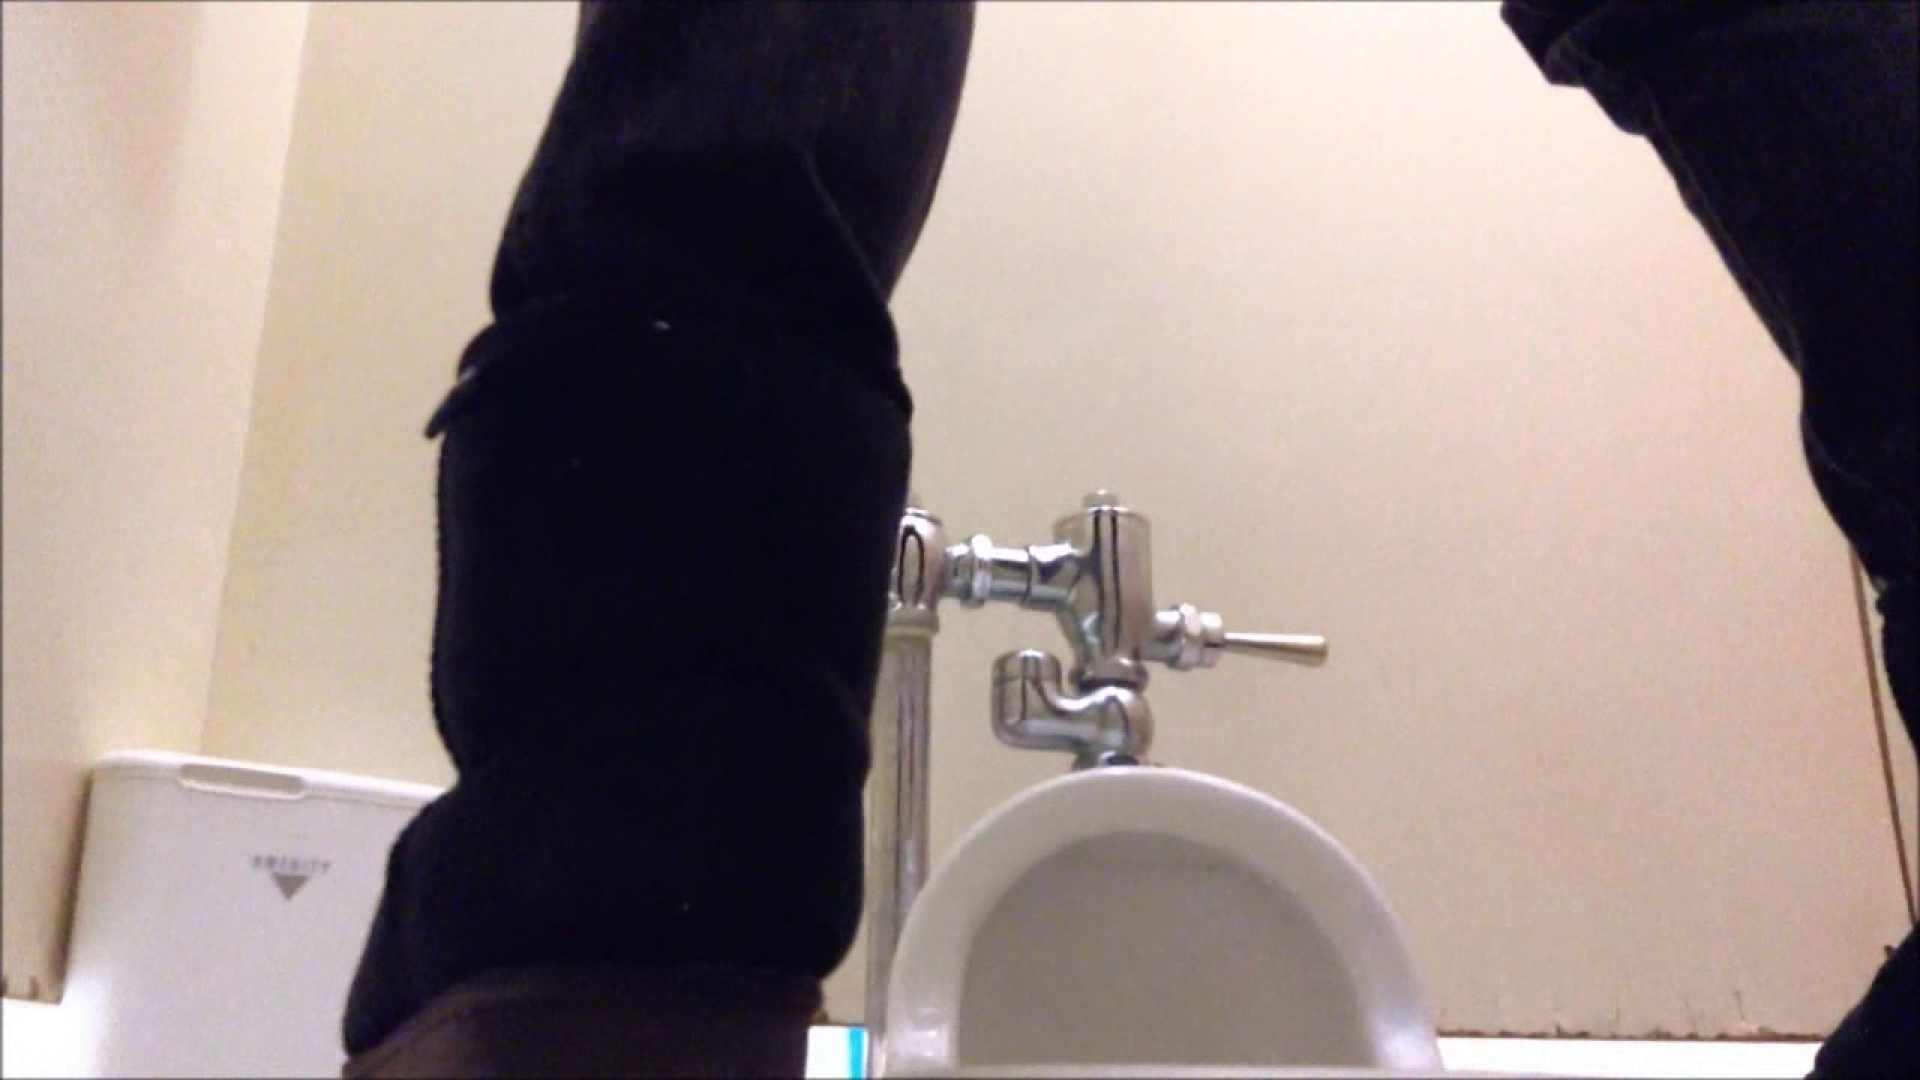 某有名大学女性洗面所 vol.10 OLのボディ セックス無修正動画無料 52PIX 3